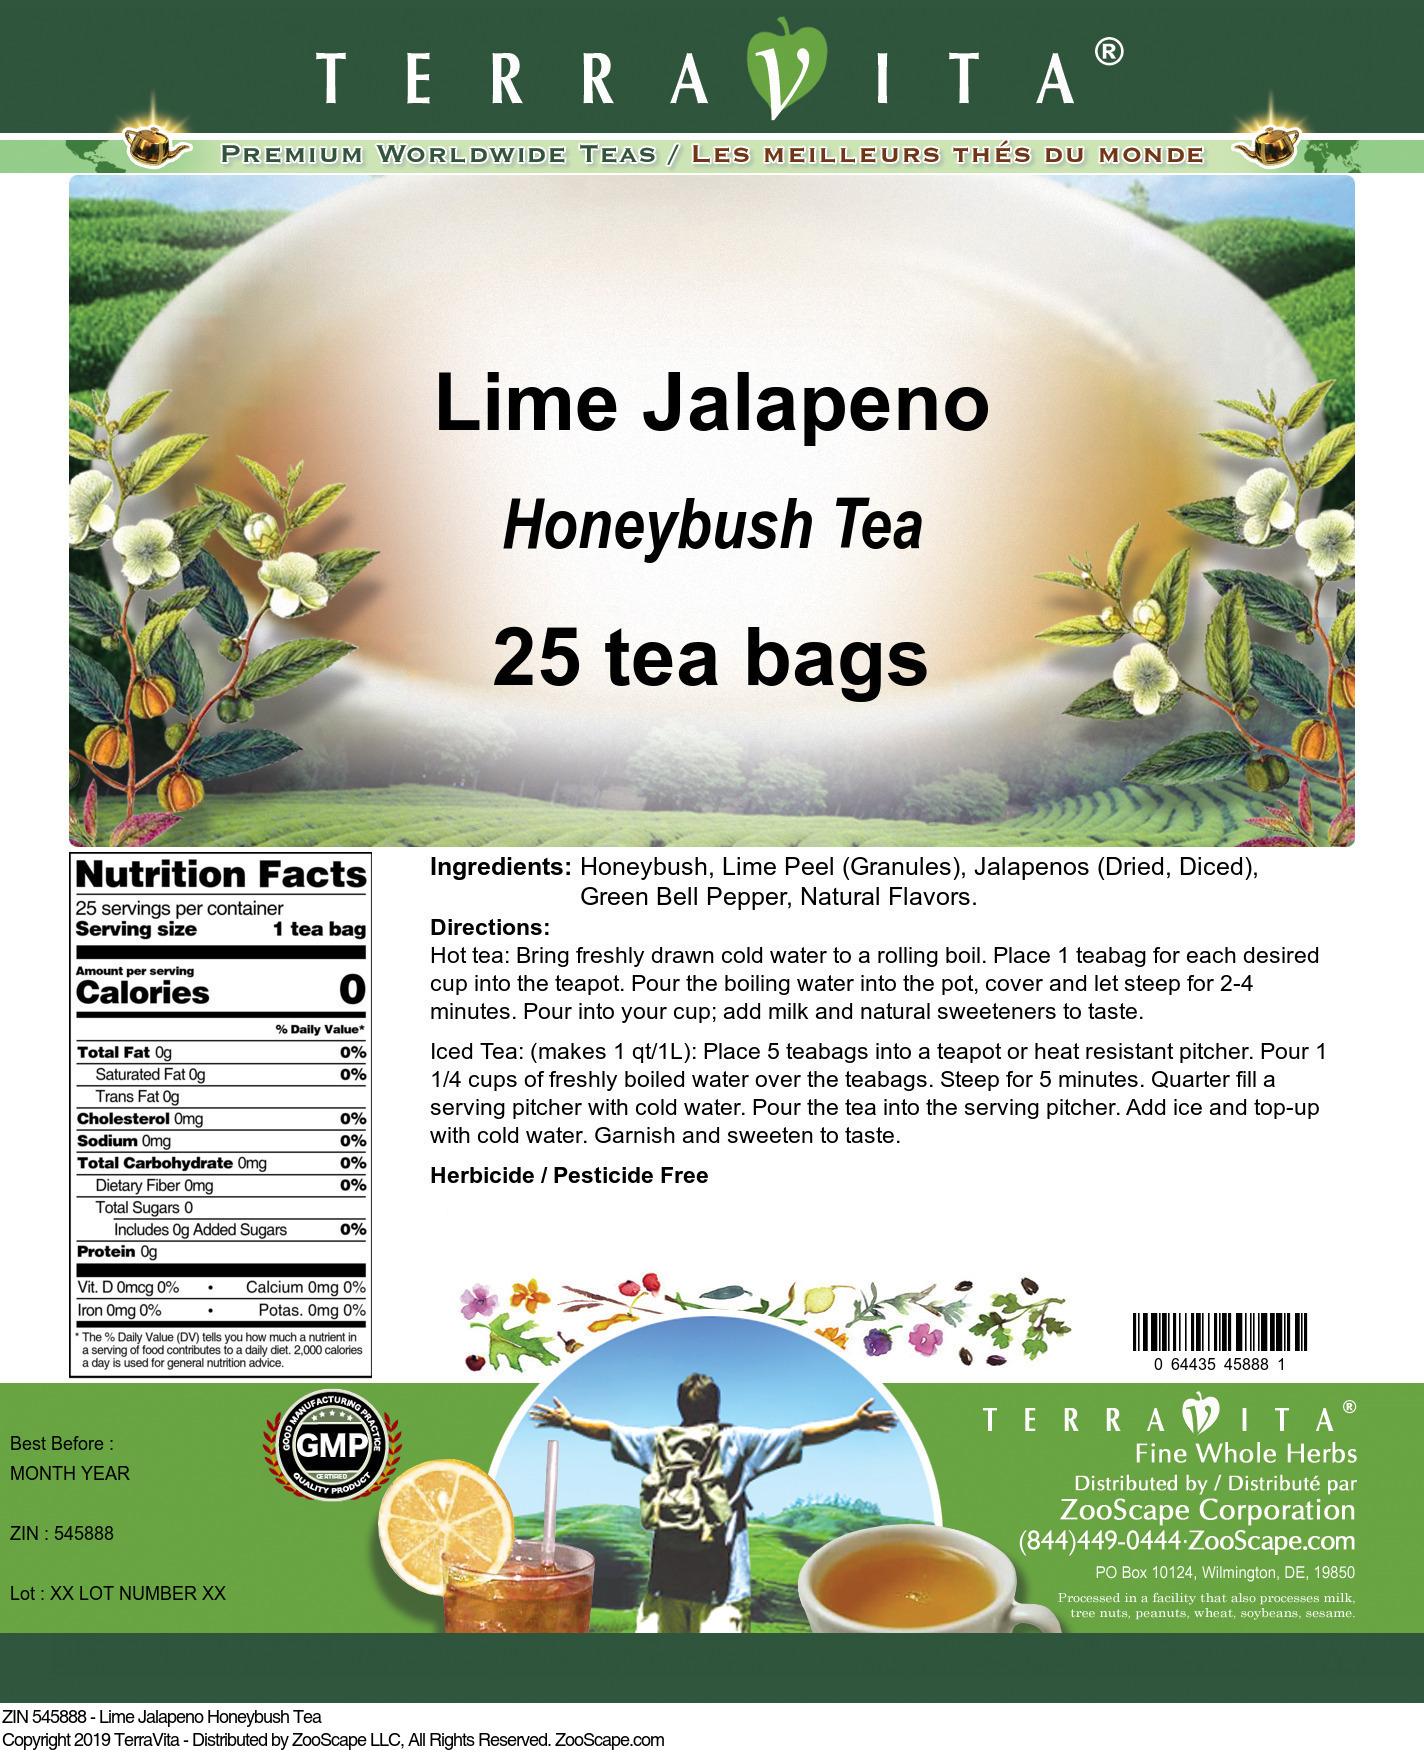 Lime Jalapeno Honeybush Tea